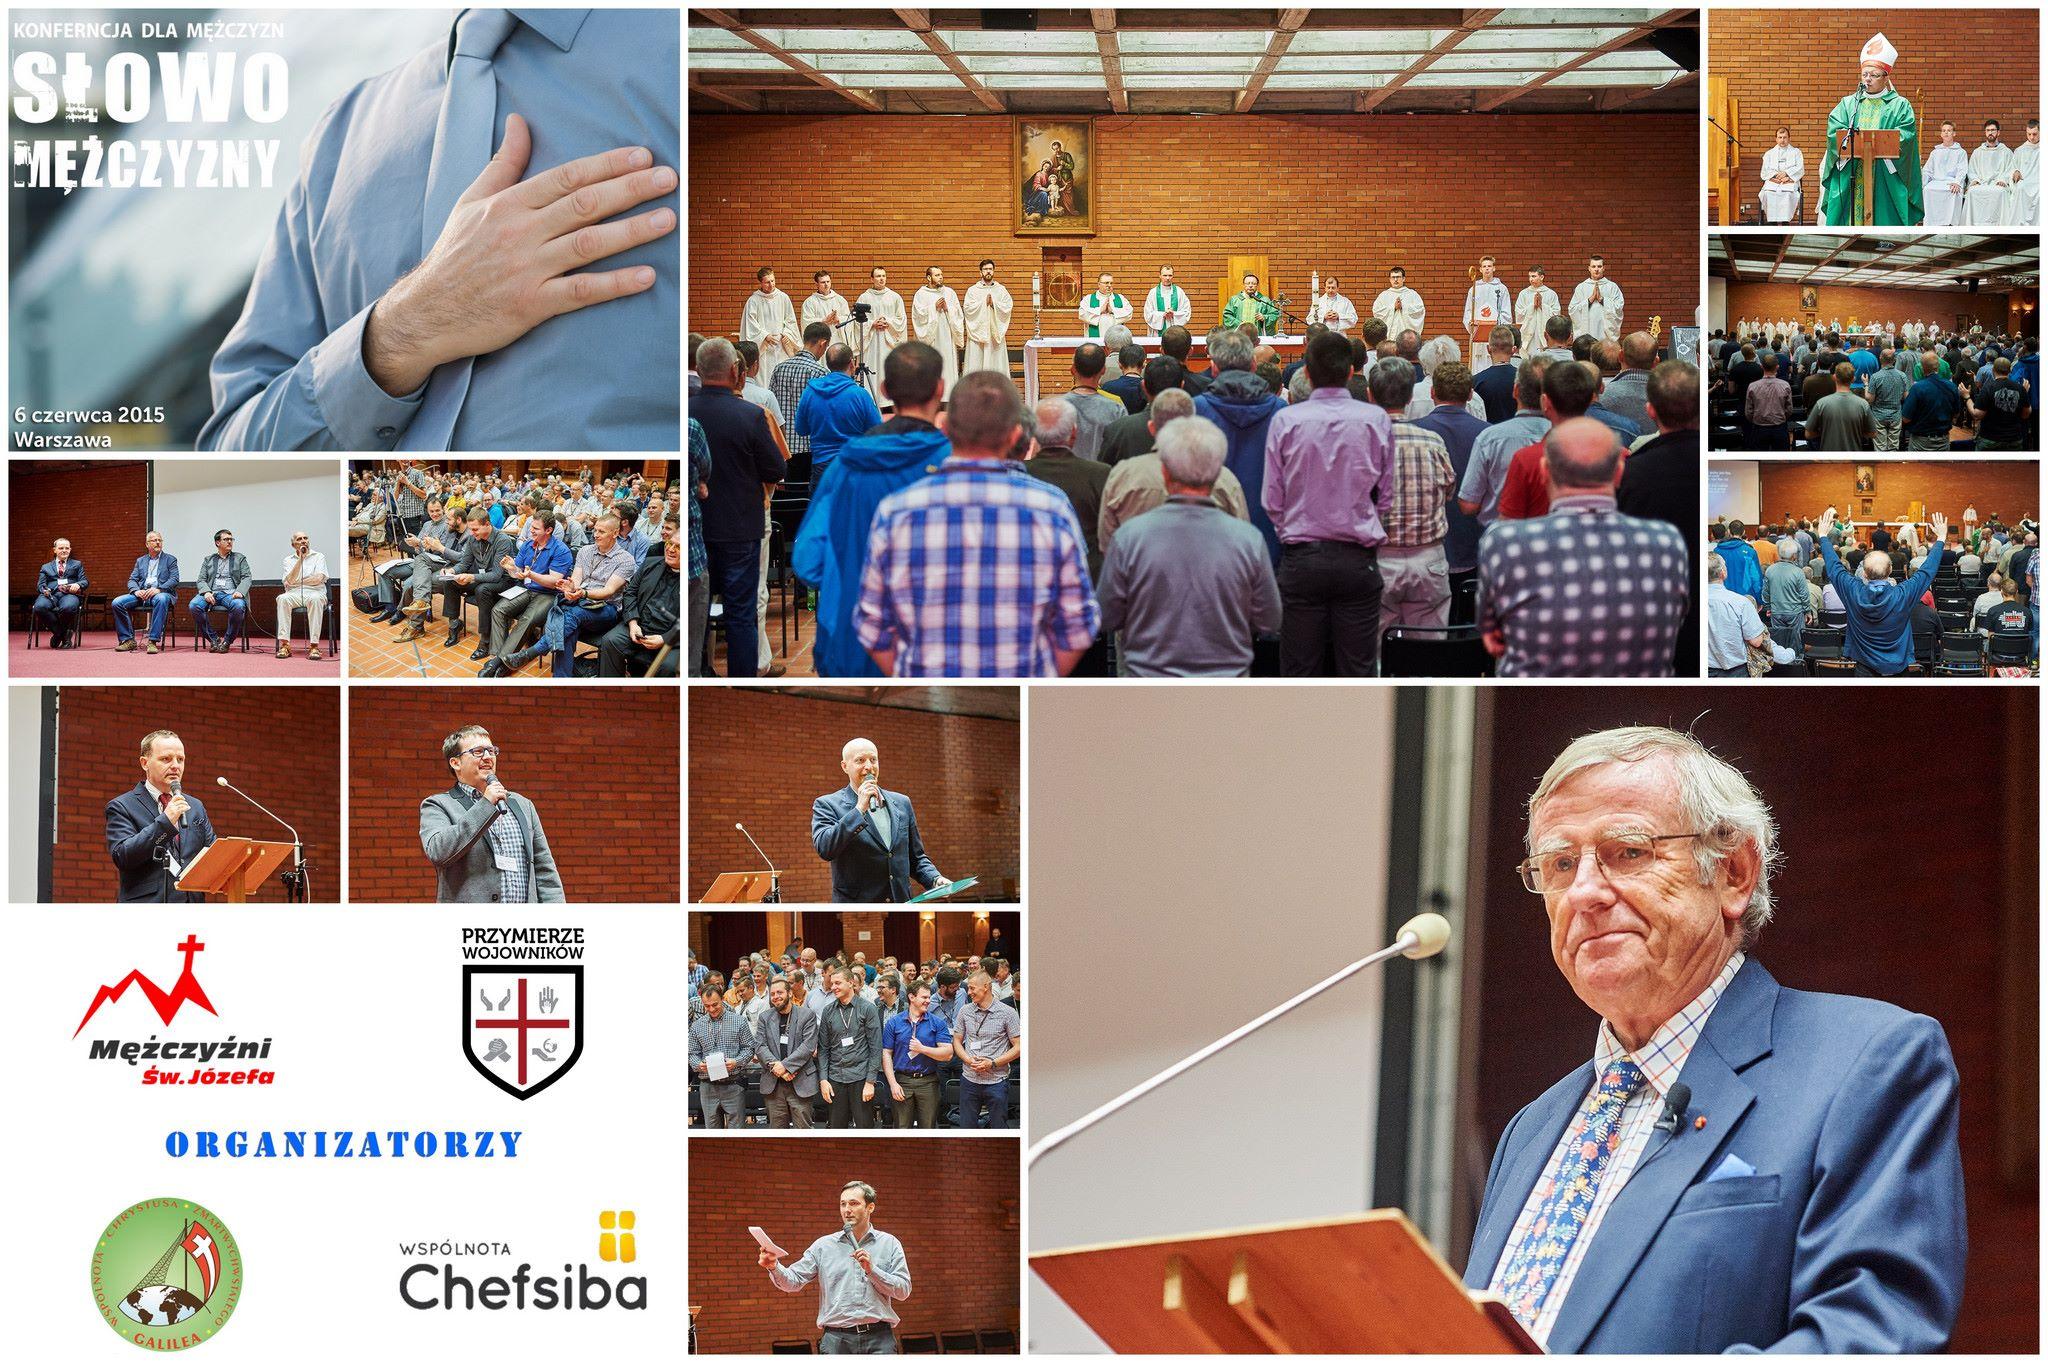 konferencja charles whitehead